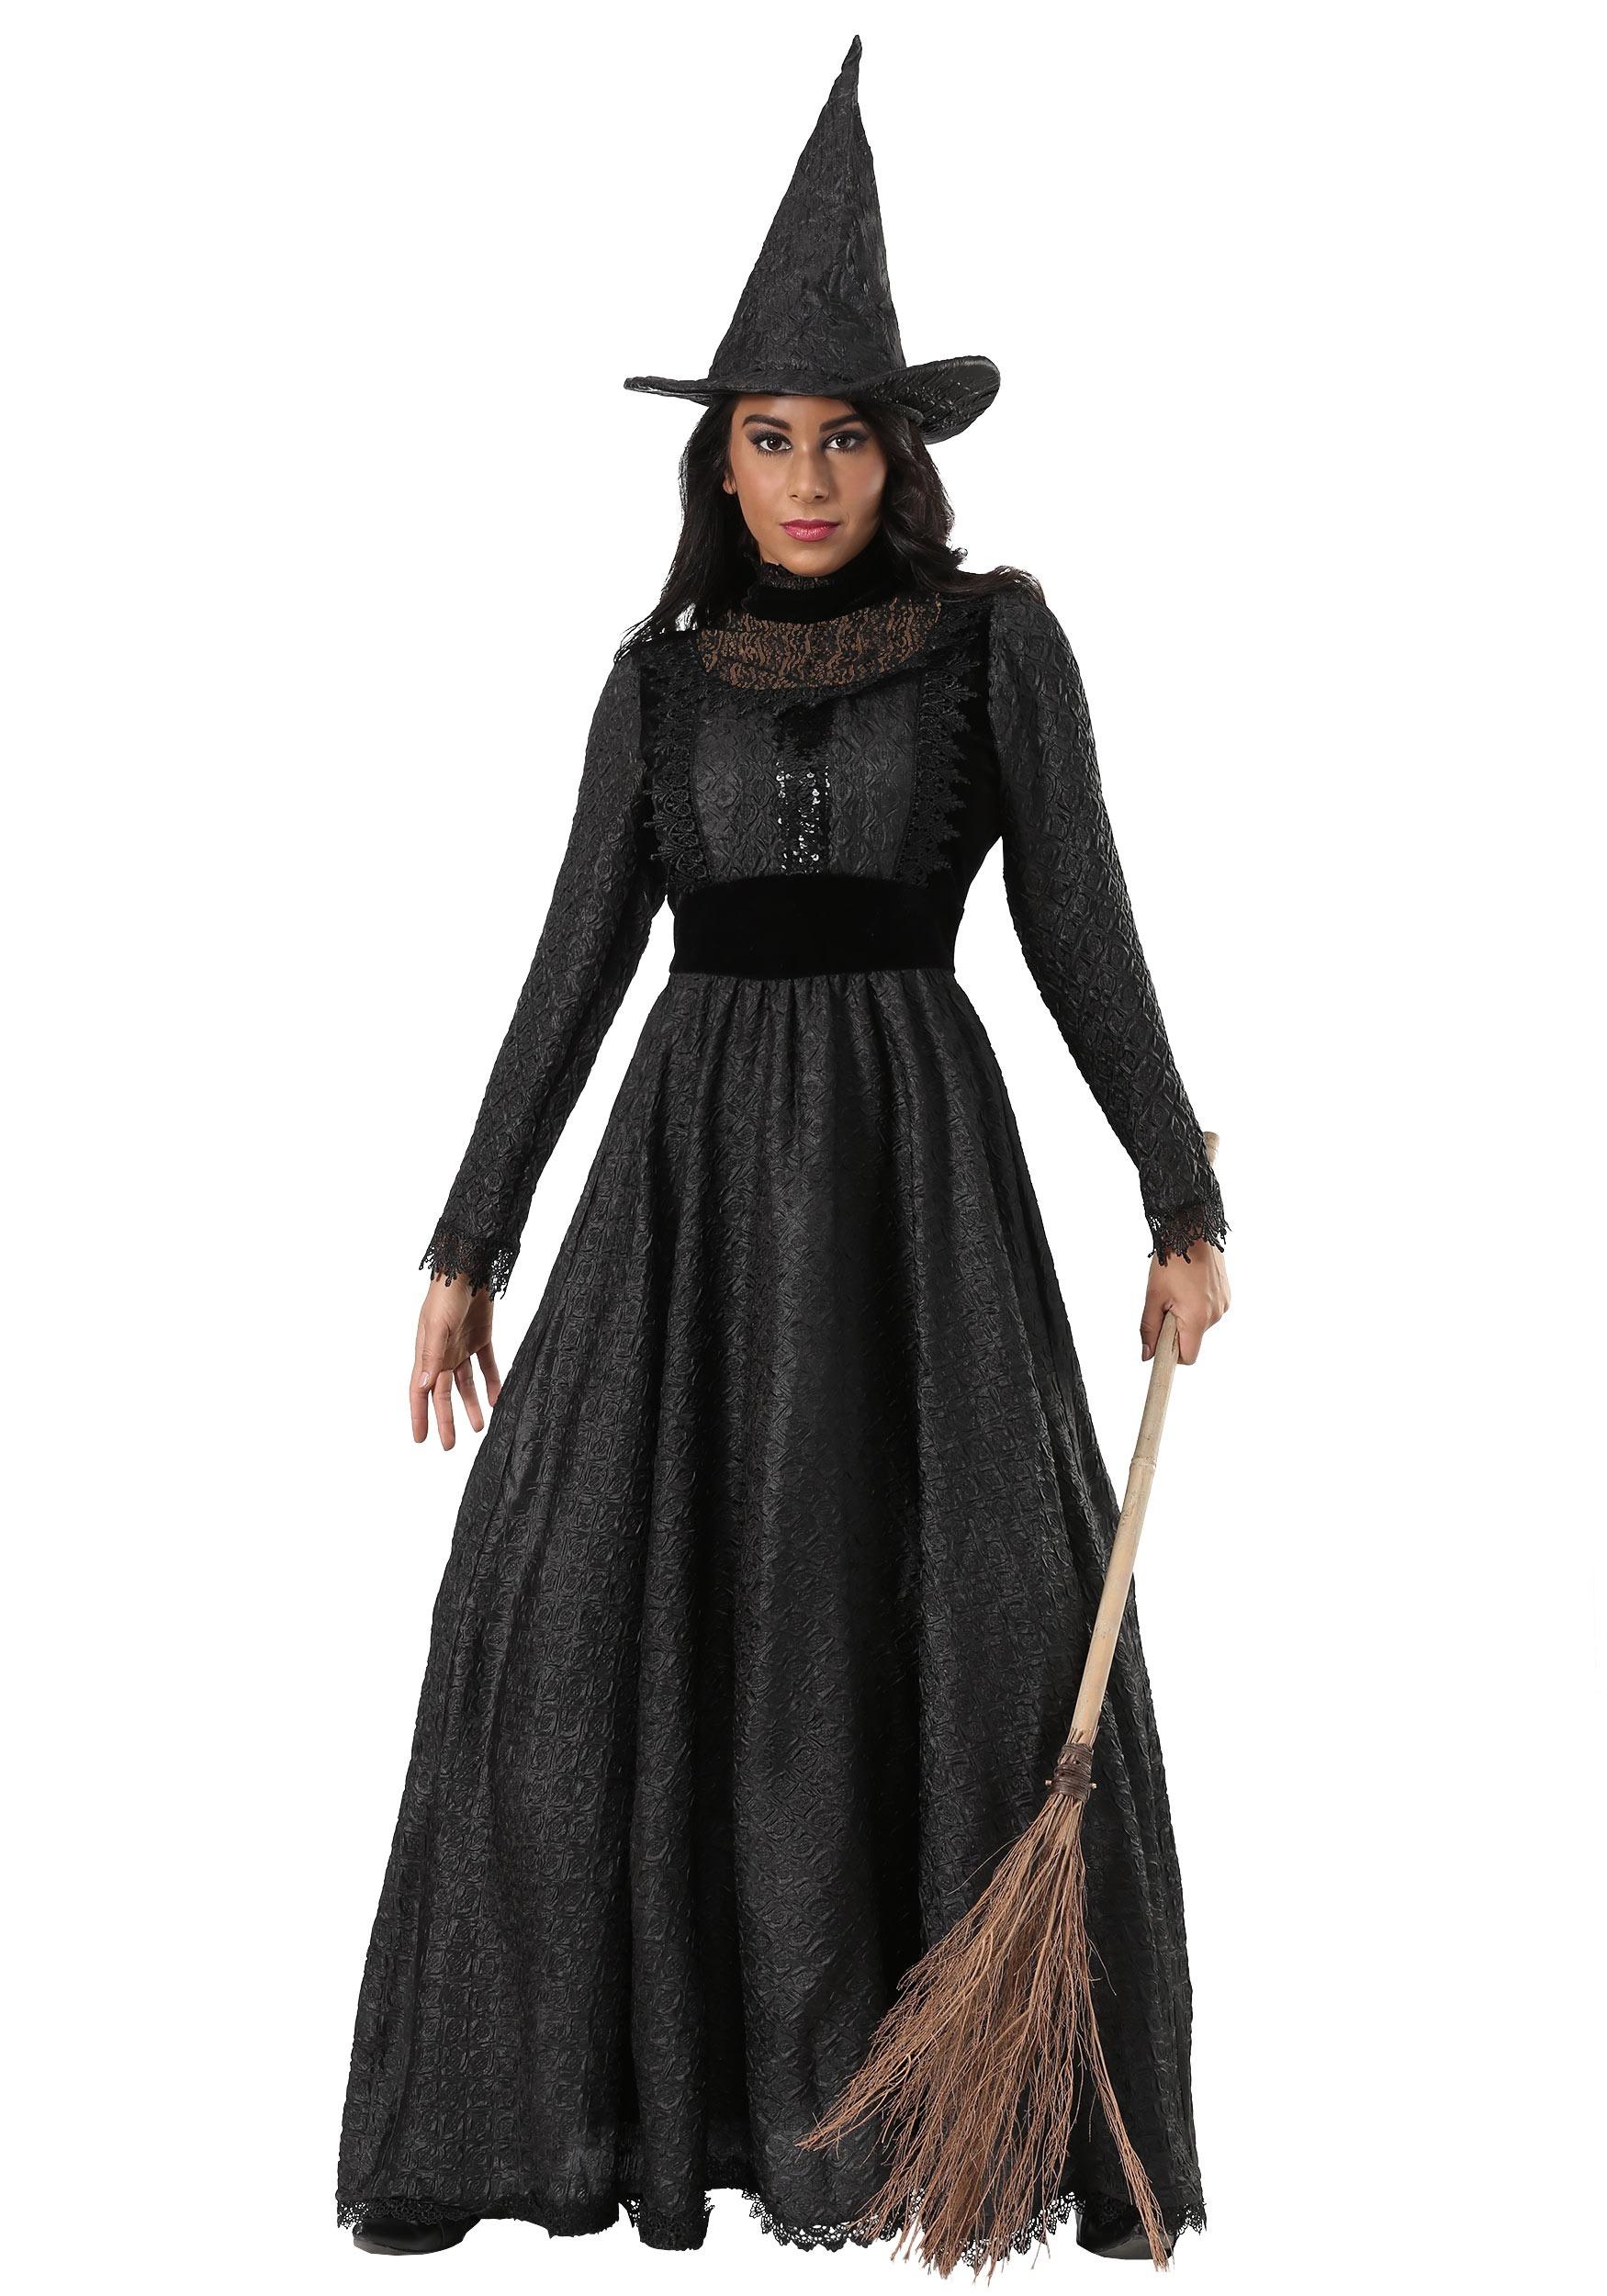 1e35c0cc45c Deluxe Plus Size Dark Witch Costume for Women 1X 2X 3X